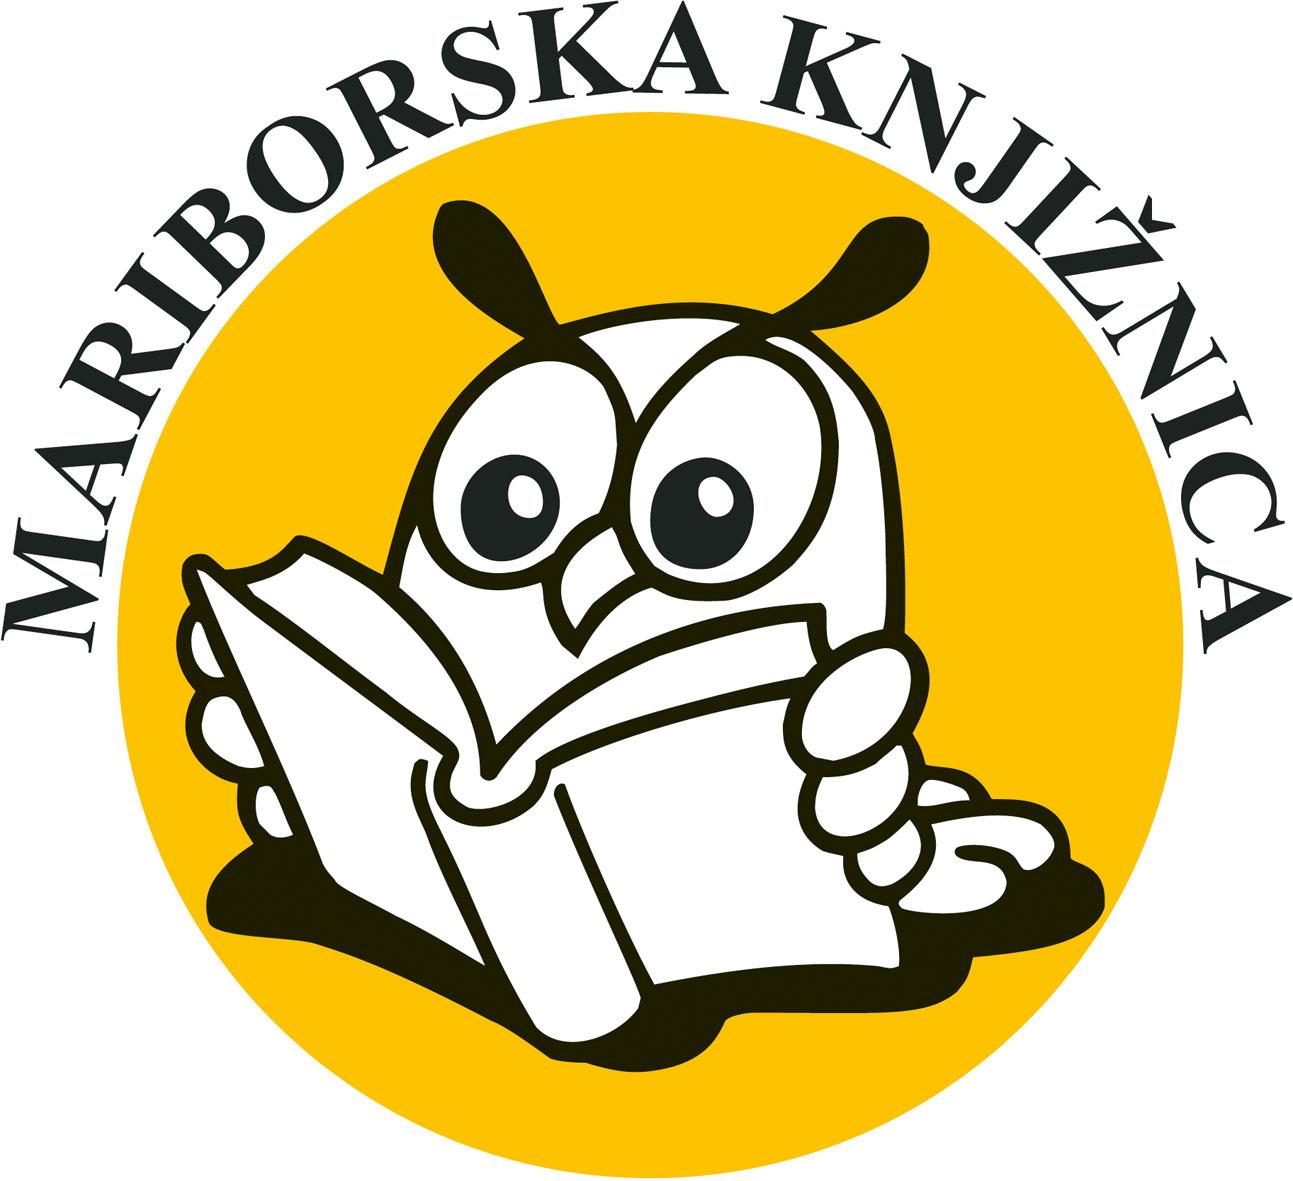 Osnovni_logotipMK.jpg